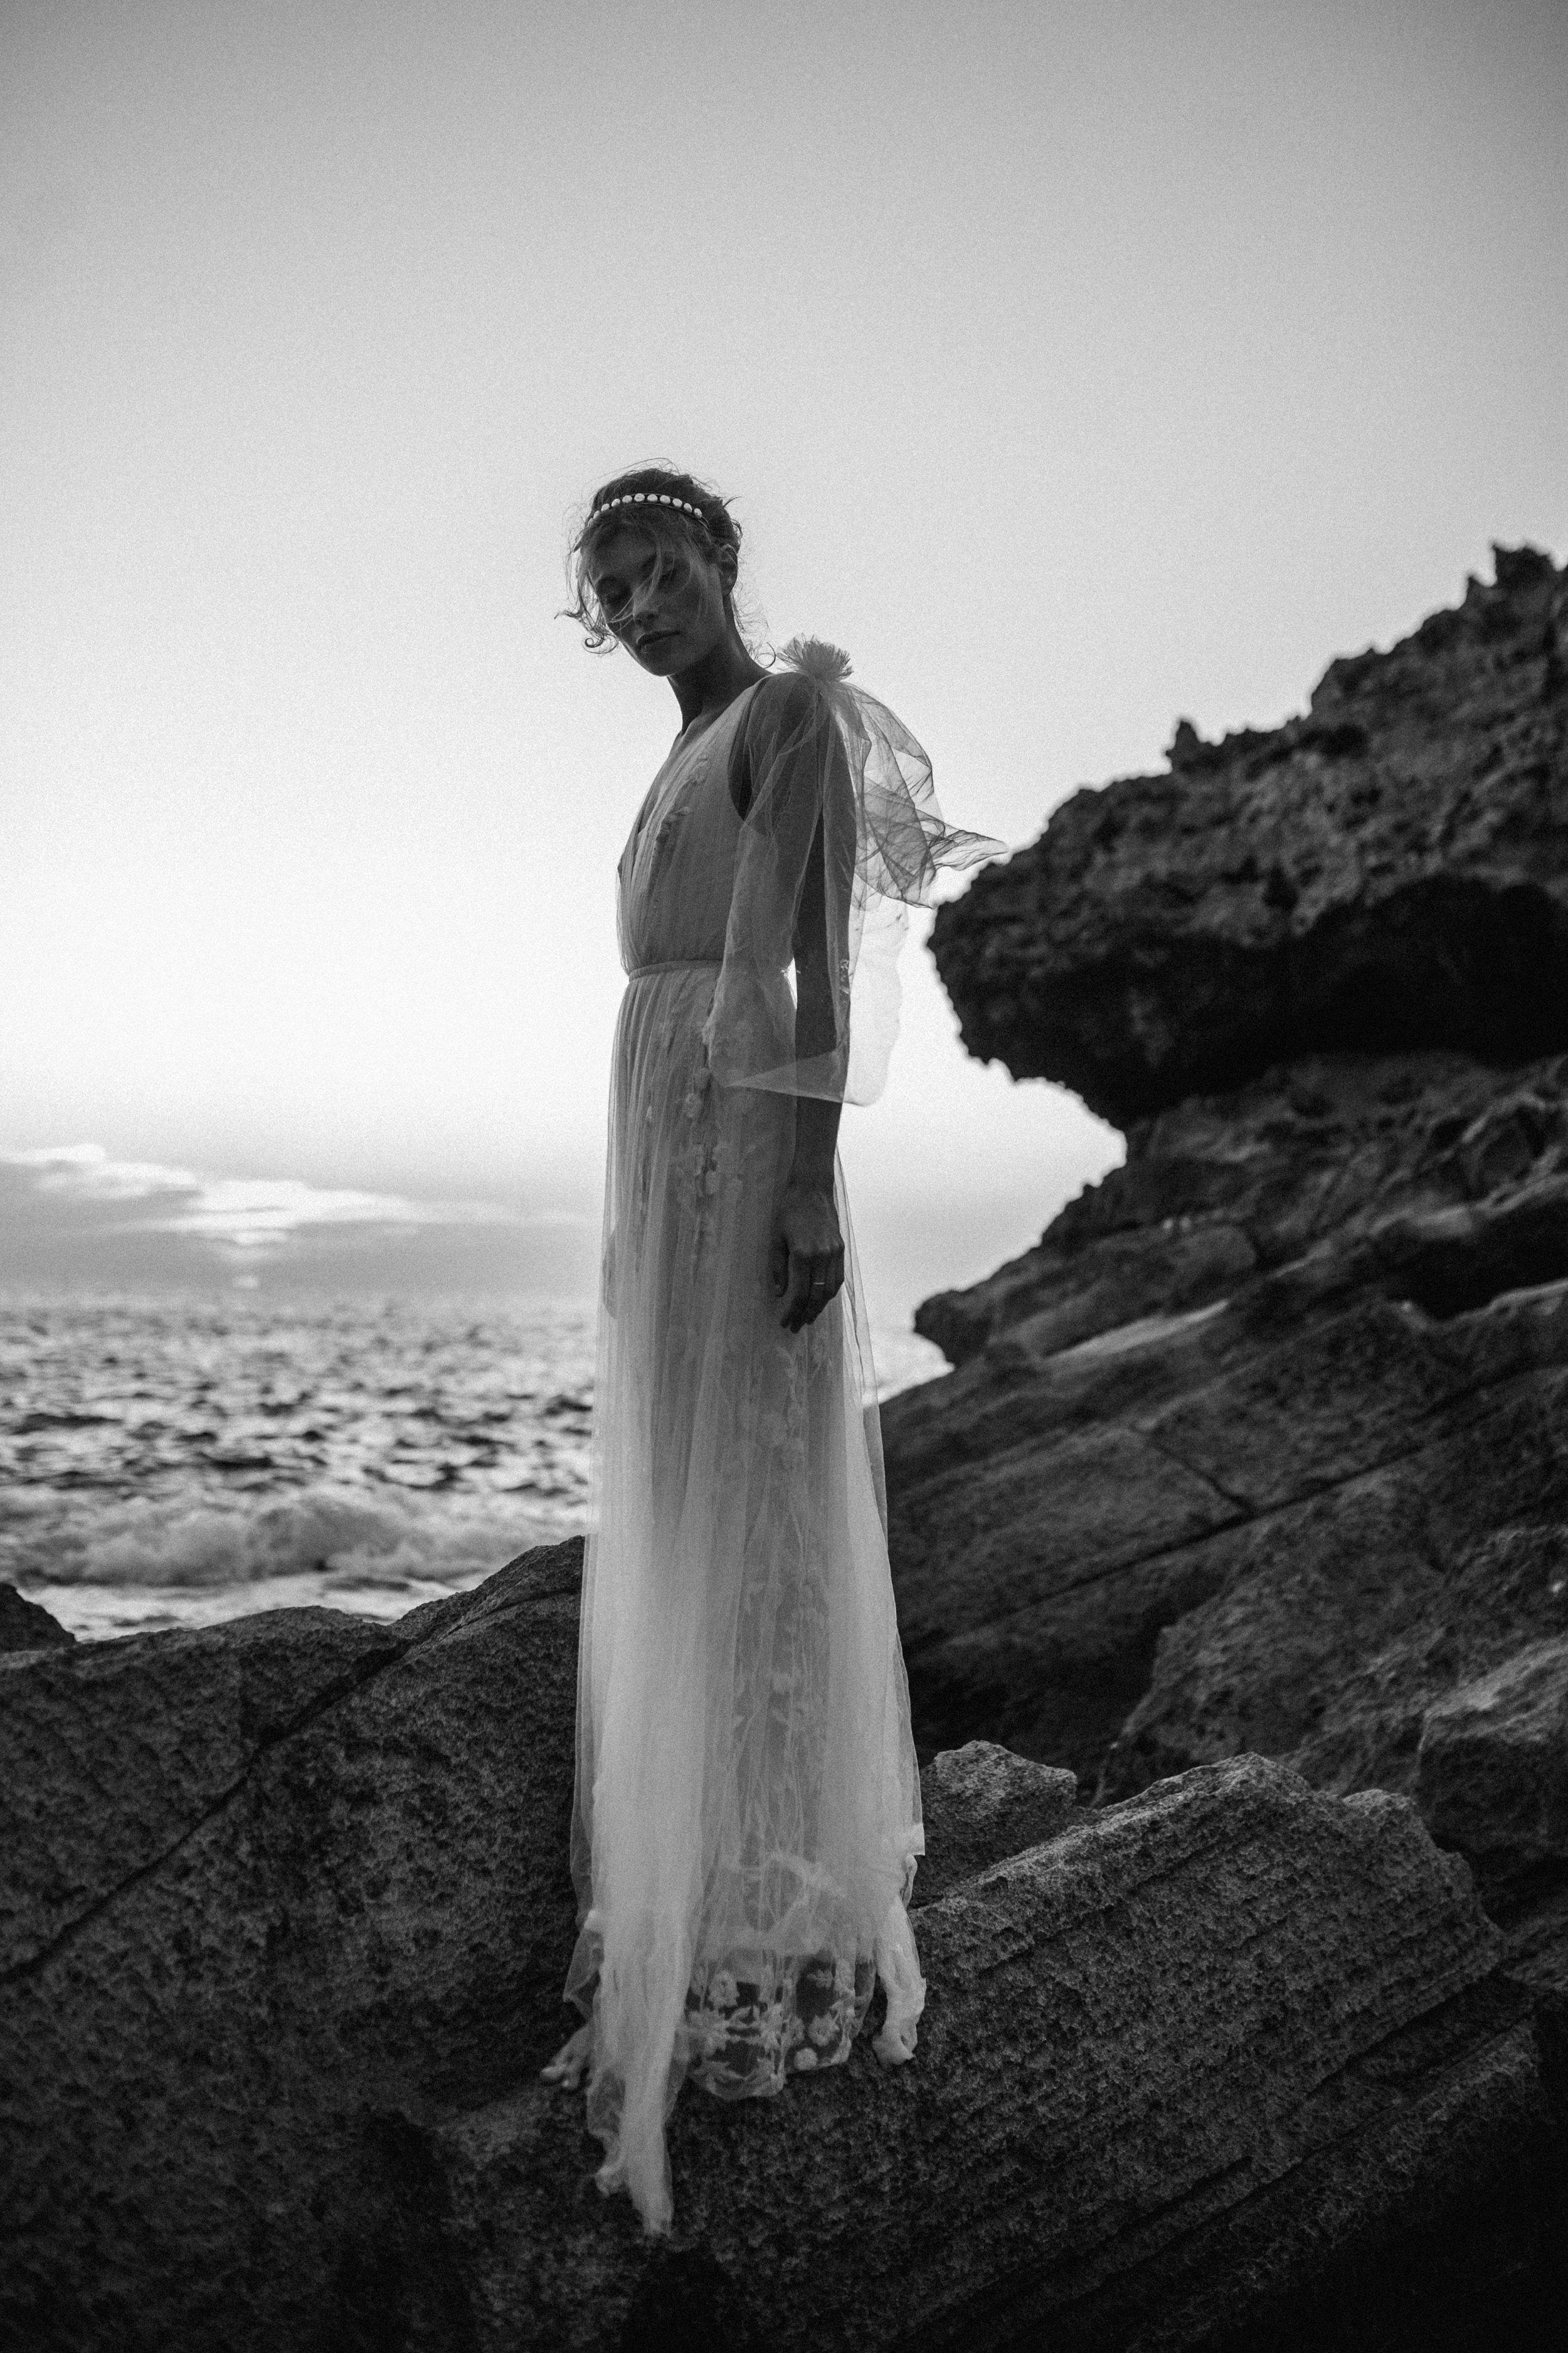 Mallorca-Pia-Anna-Christian-Wedding-Photography-Ritual-Unions-Maria-106.jpg